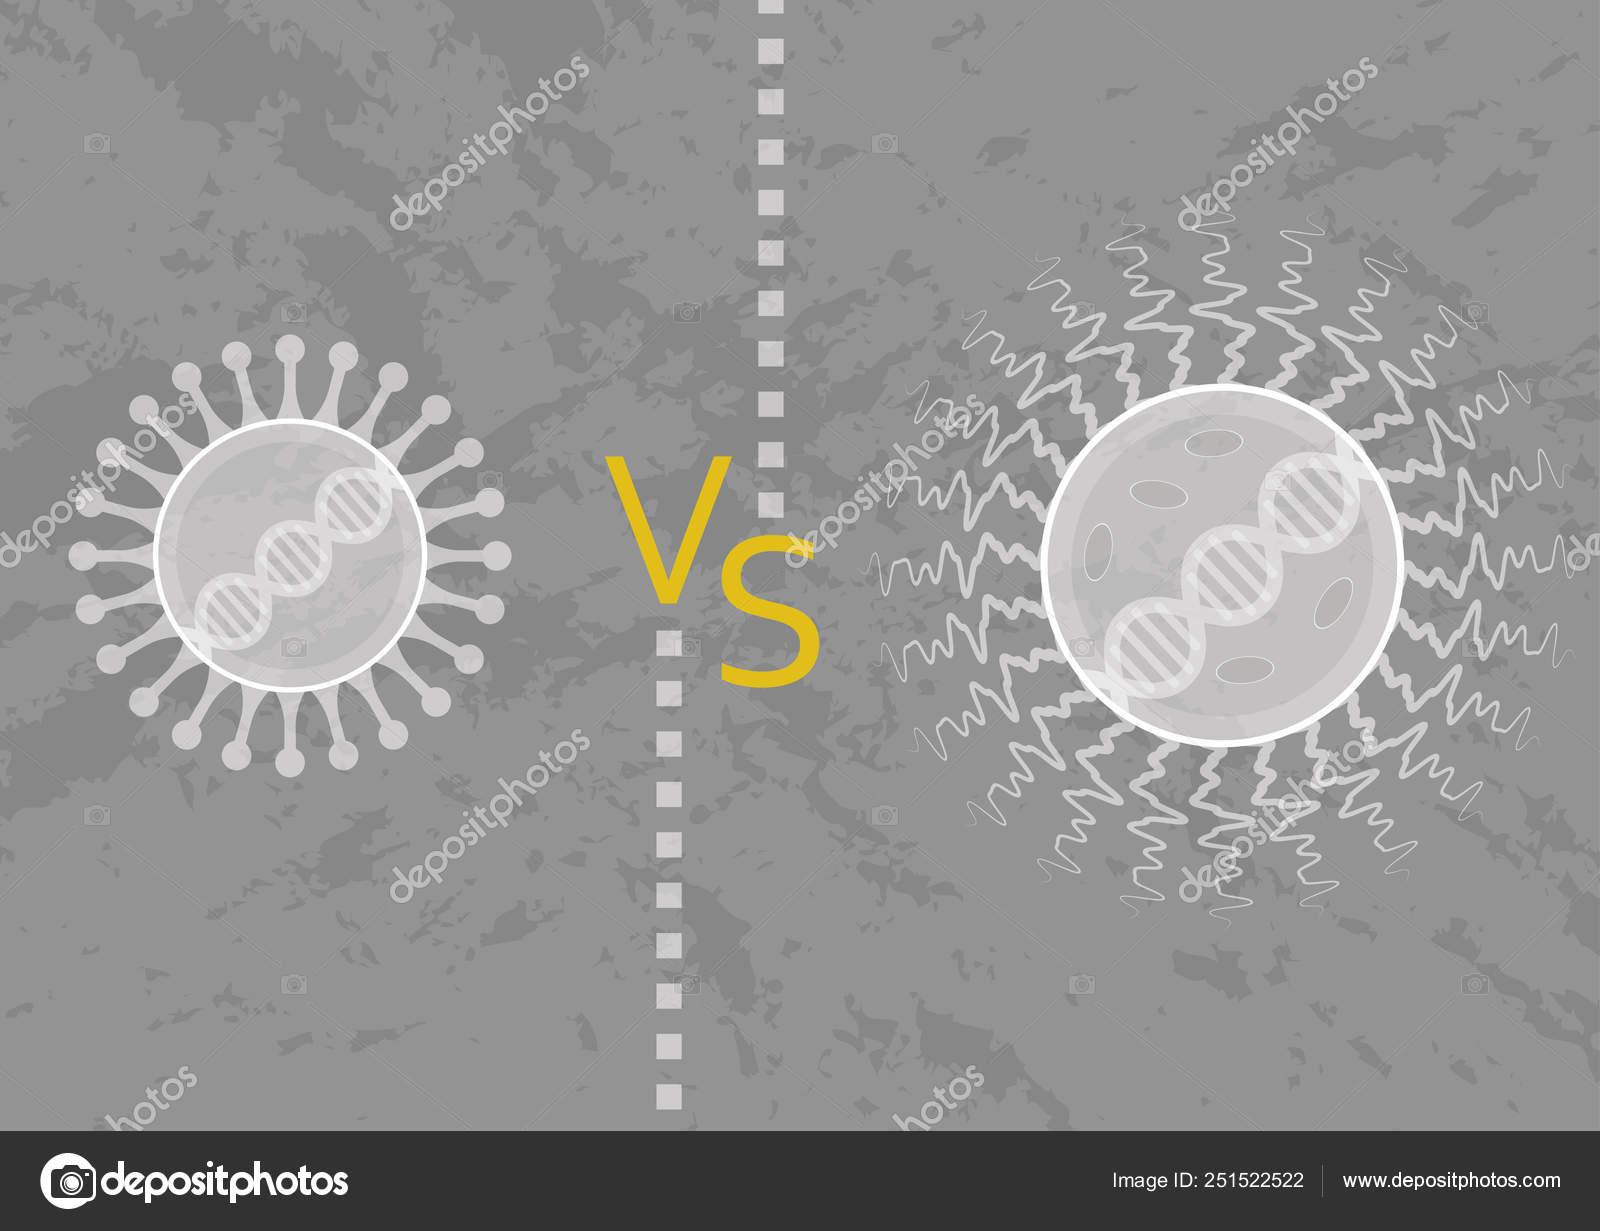 Microorganismo Virus Bacterias Sus Diferencias Estructura